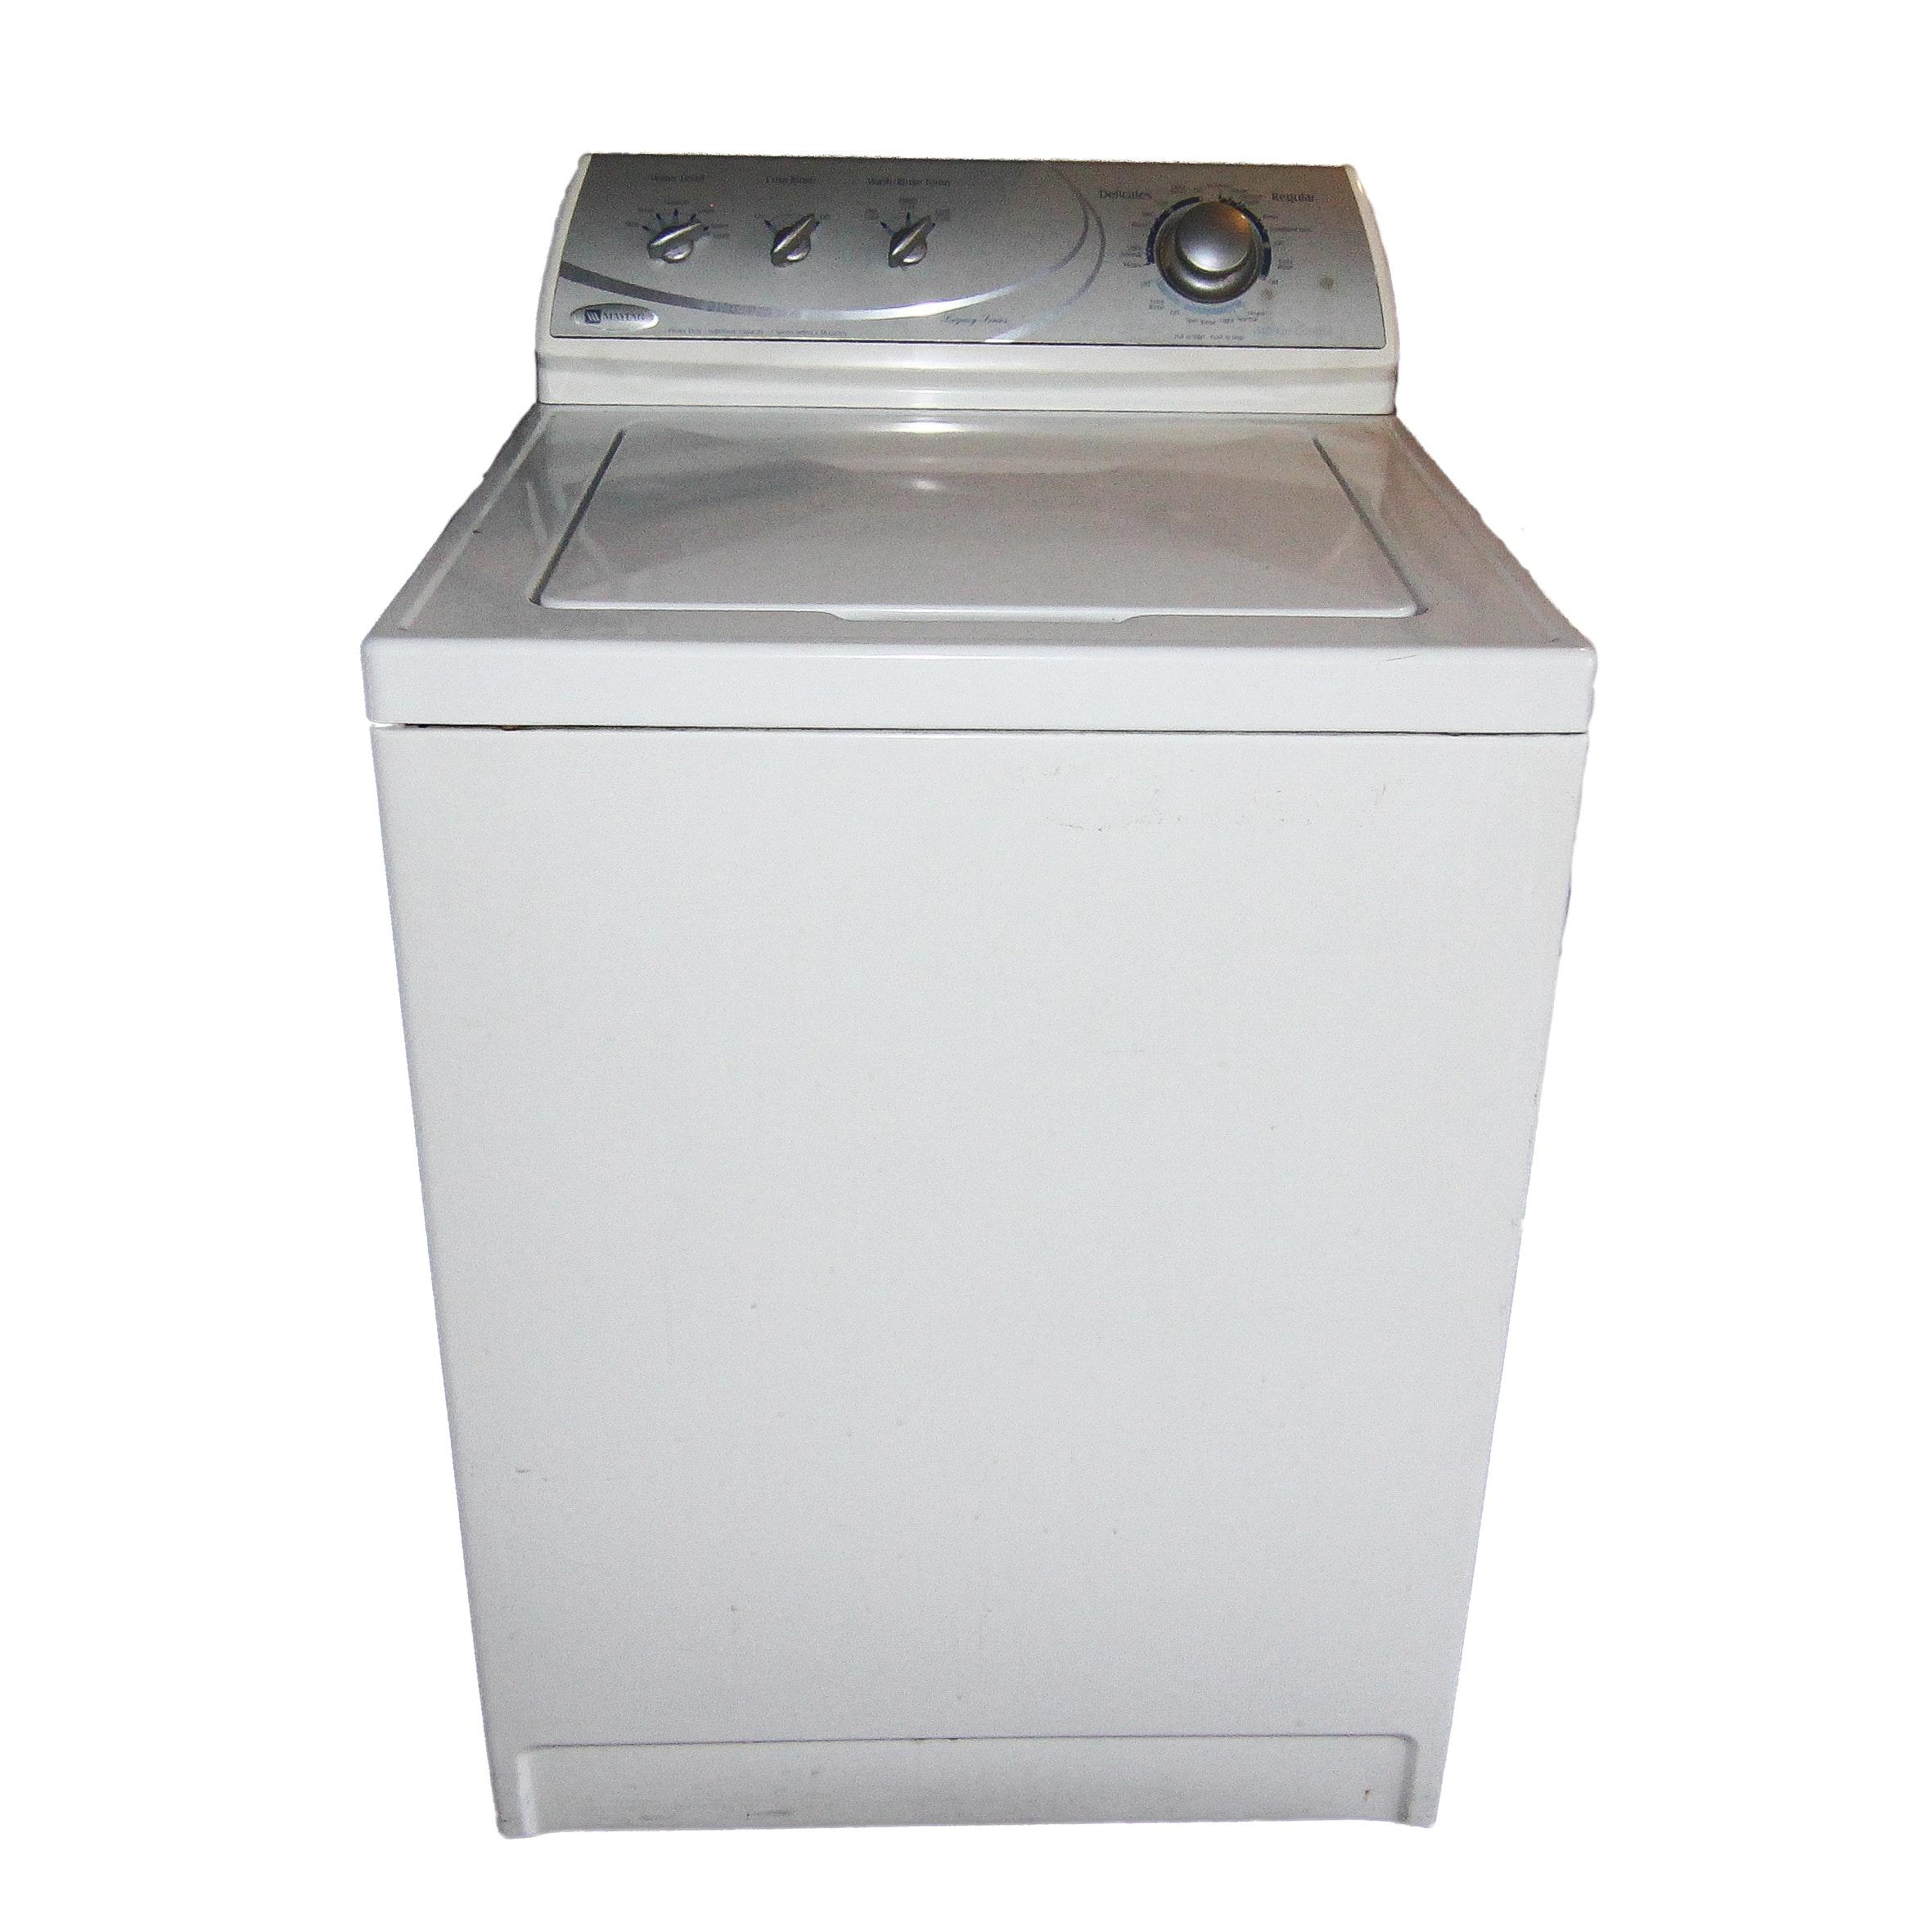 Superbe Maytag Legacy Series Washing Machine